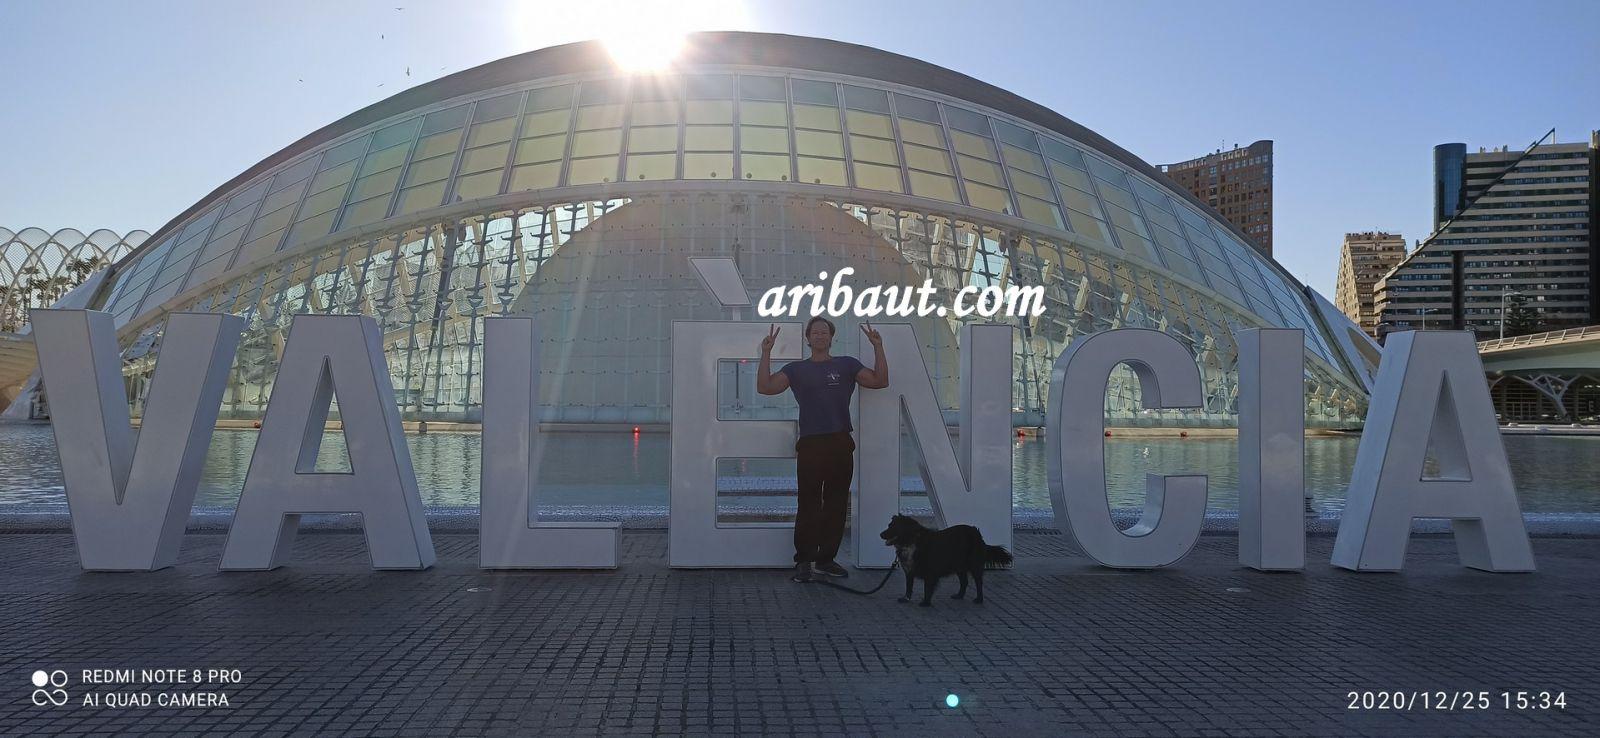 http://zeforums.com/uploads/images/pierrearibautzetradervalenciavalenceciteartssciences25decembre20201_1610051041.jpg